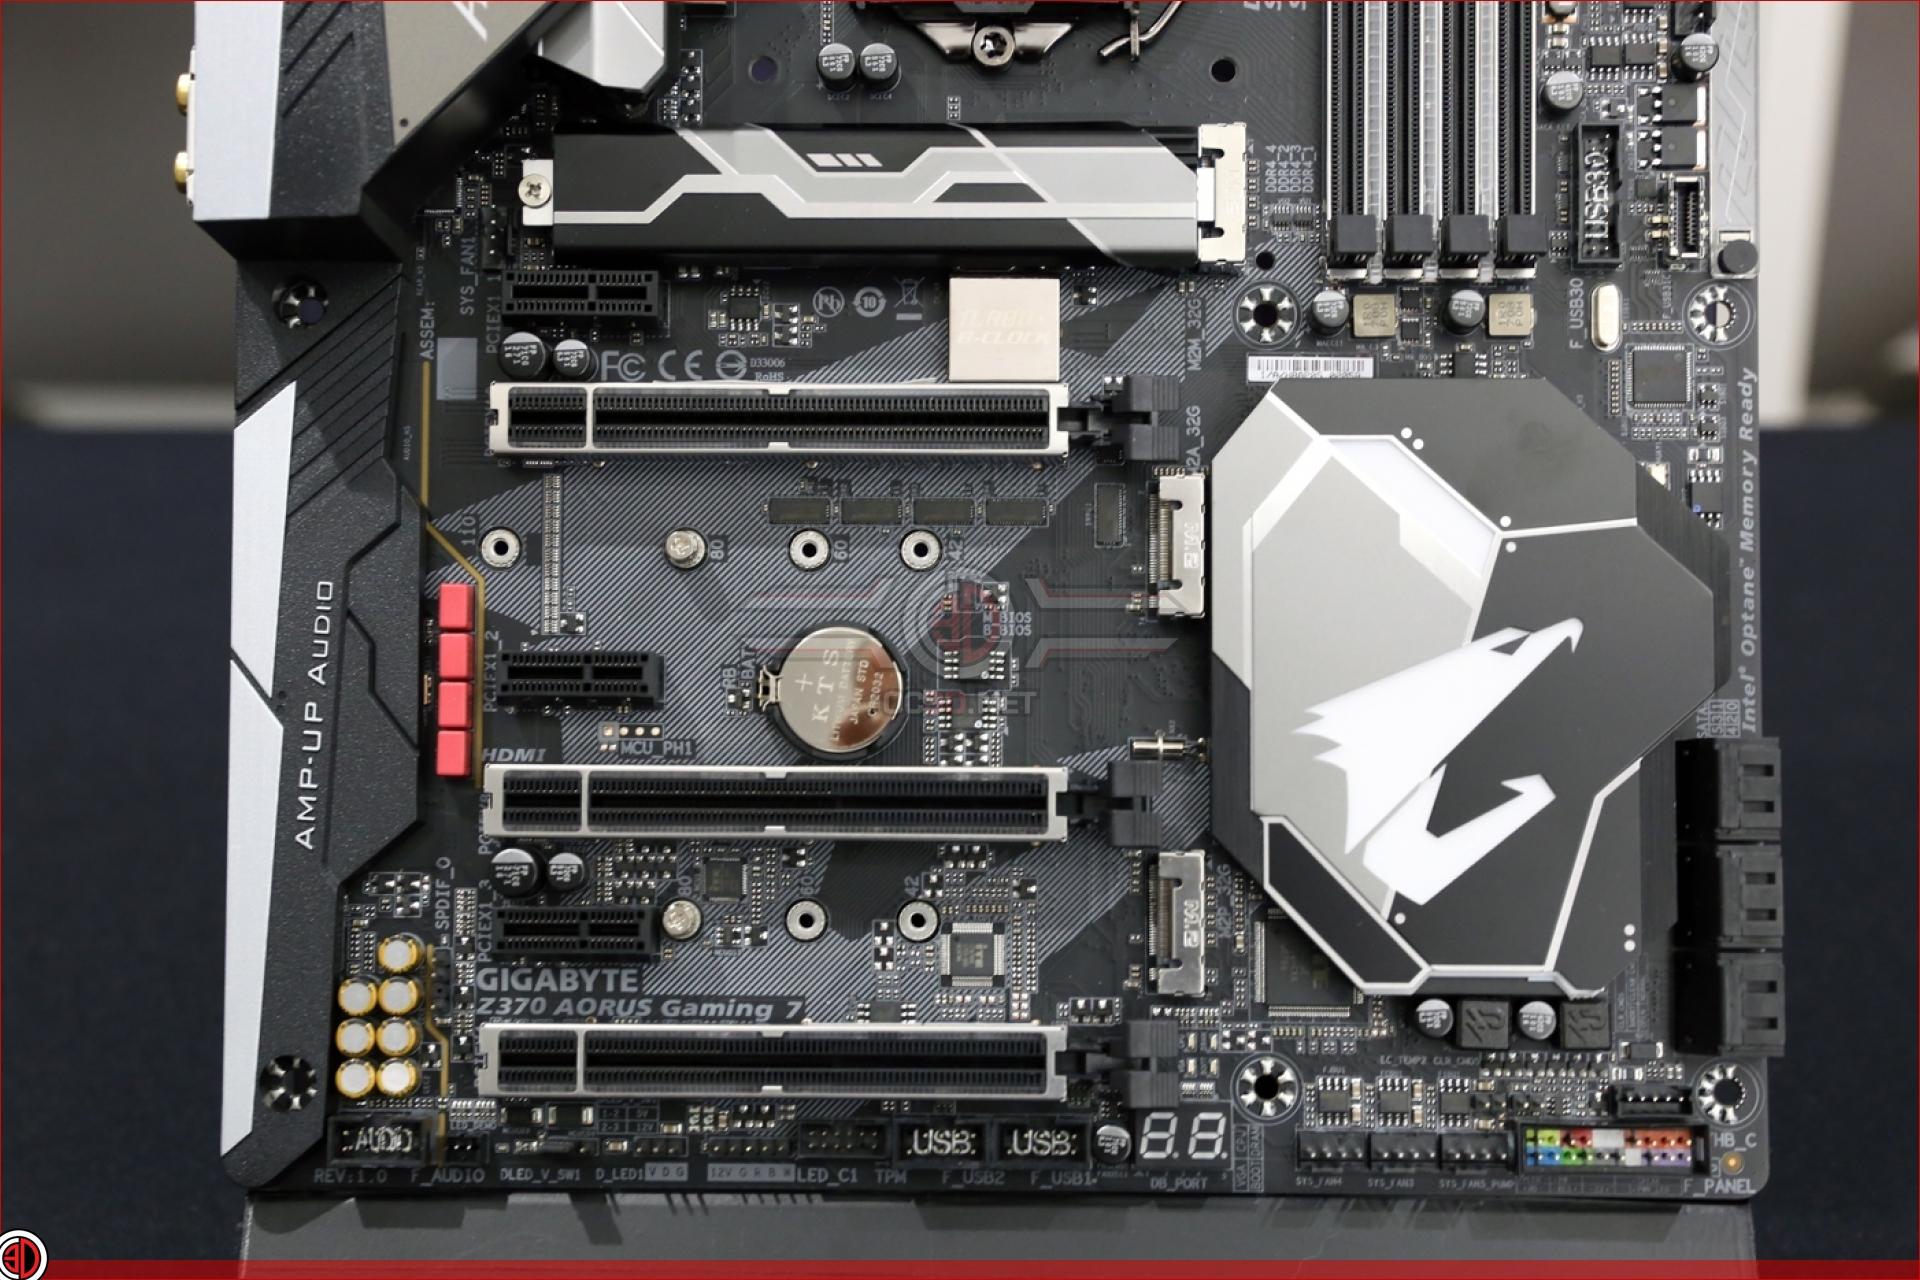 Gigabyte Z370 Aorus Gaming 7 Preview | Up Close | CPU & Mainboard